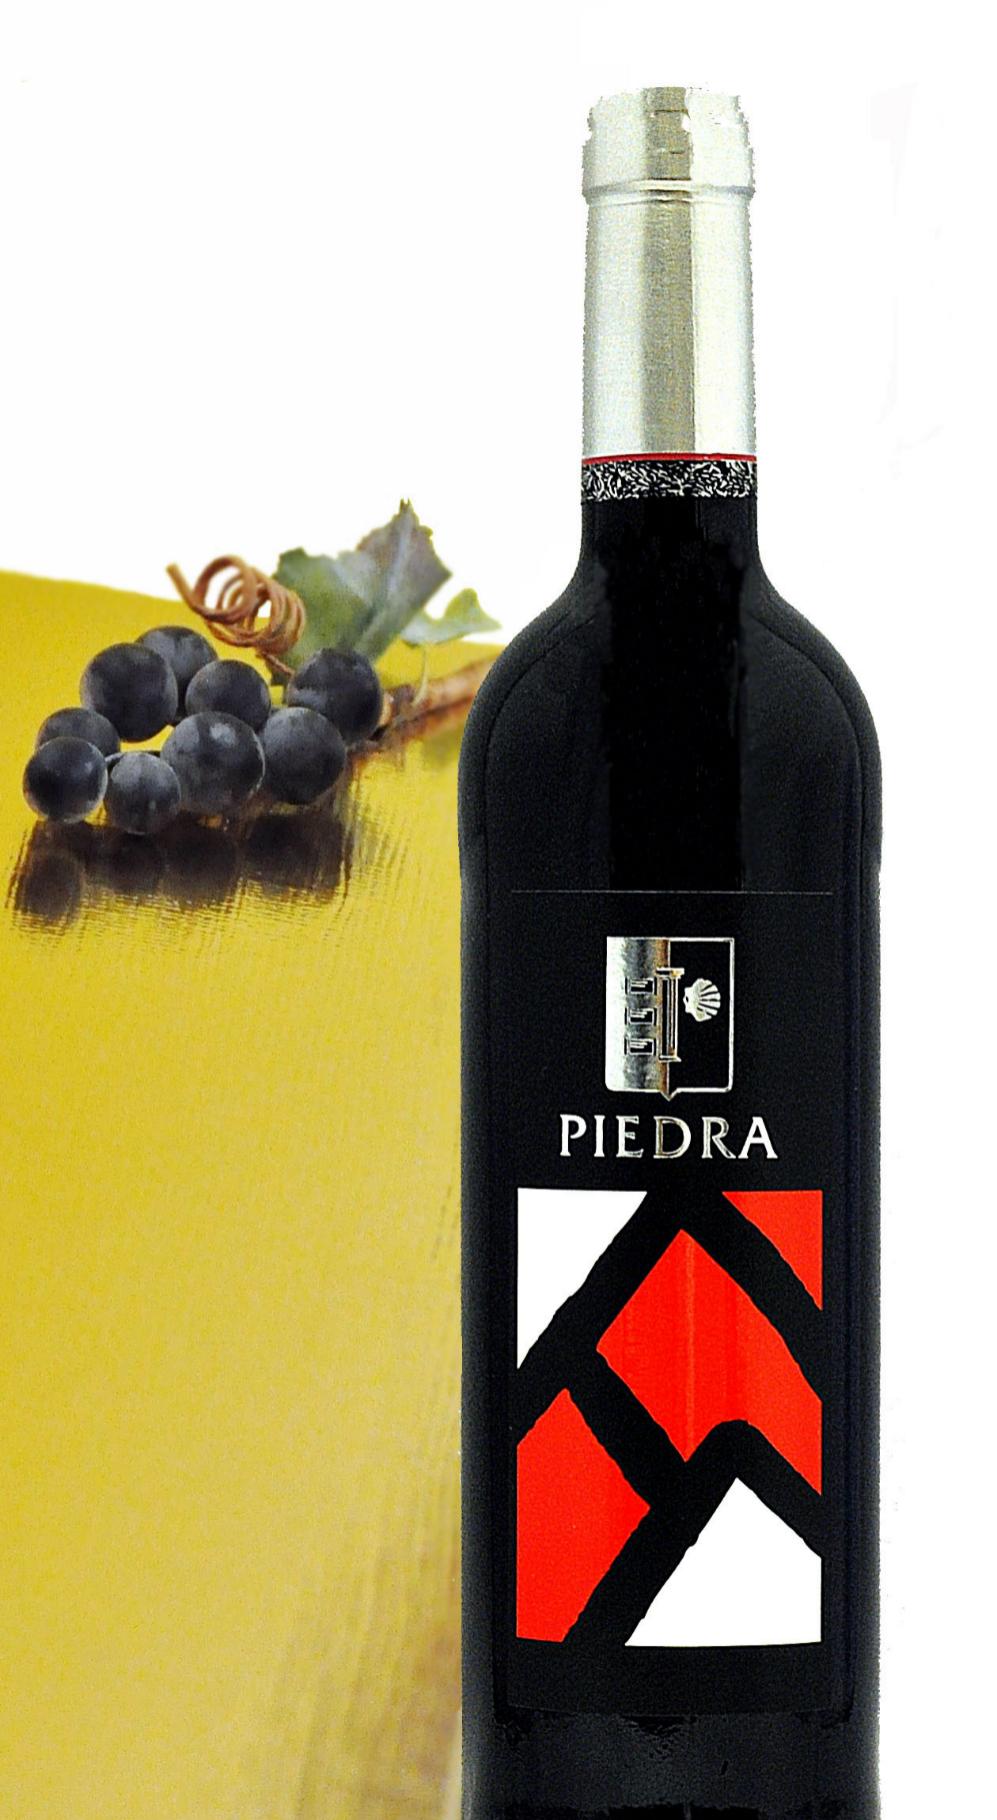 Piedra Etiqueta Roja 2010 es un vino tan elegante visualmente como...